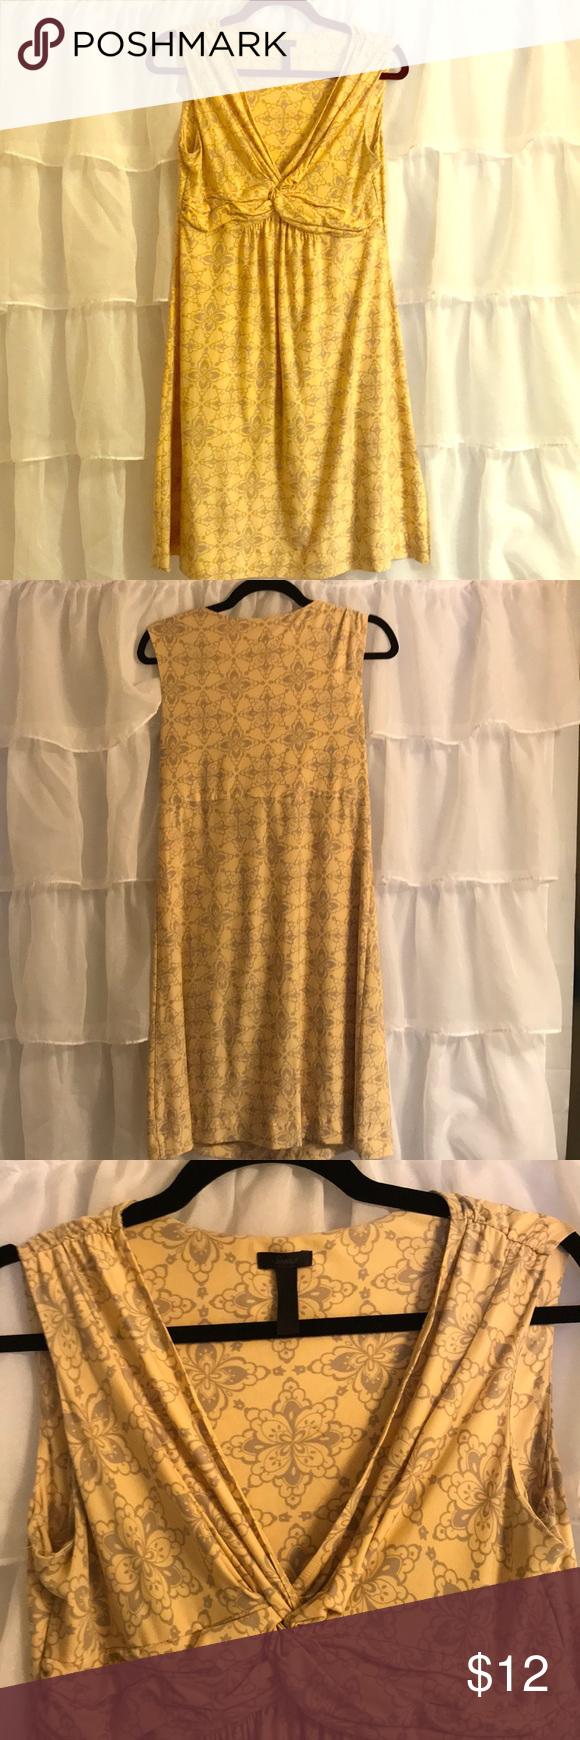 Yellow dress knee length  Soma knee length yellow dress size medium  Yellow dress Gray and